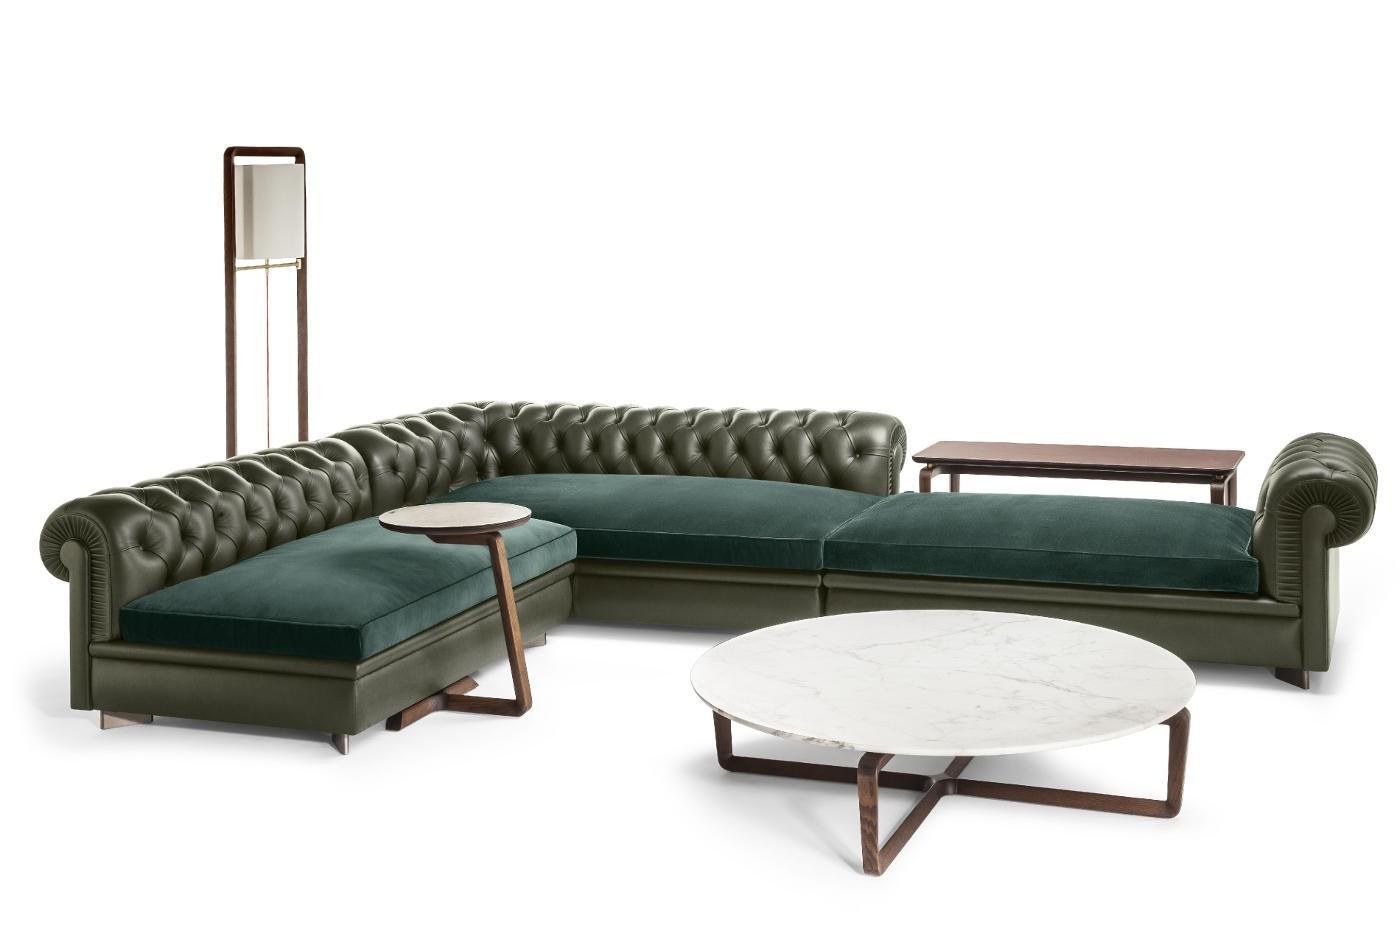 Poltrona Sofa.Poltrona Frau Chester Line Sofa